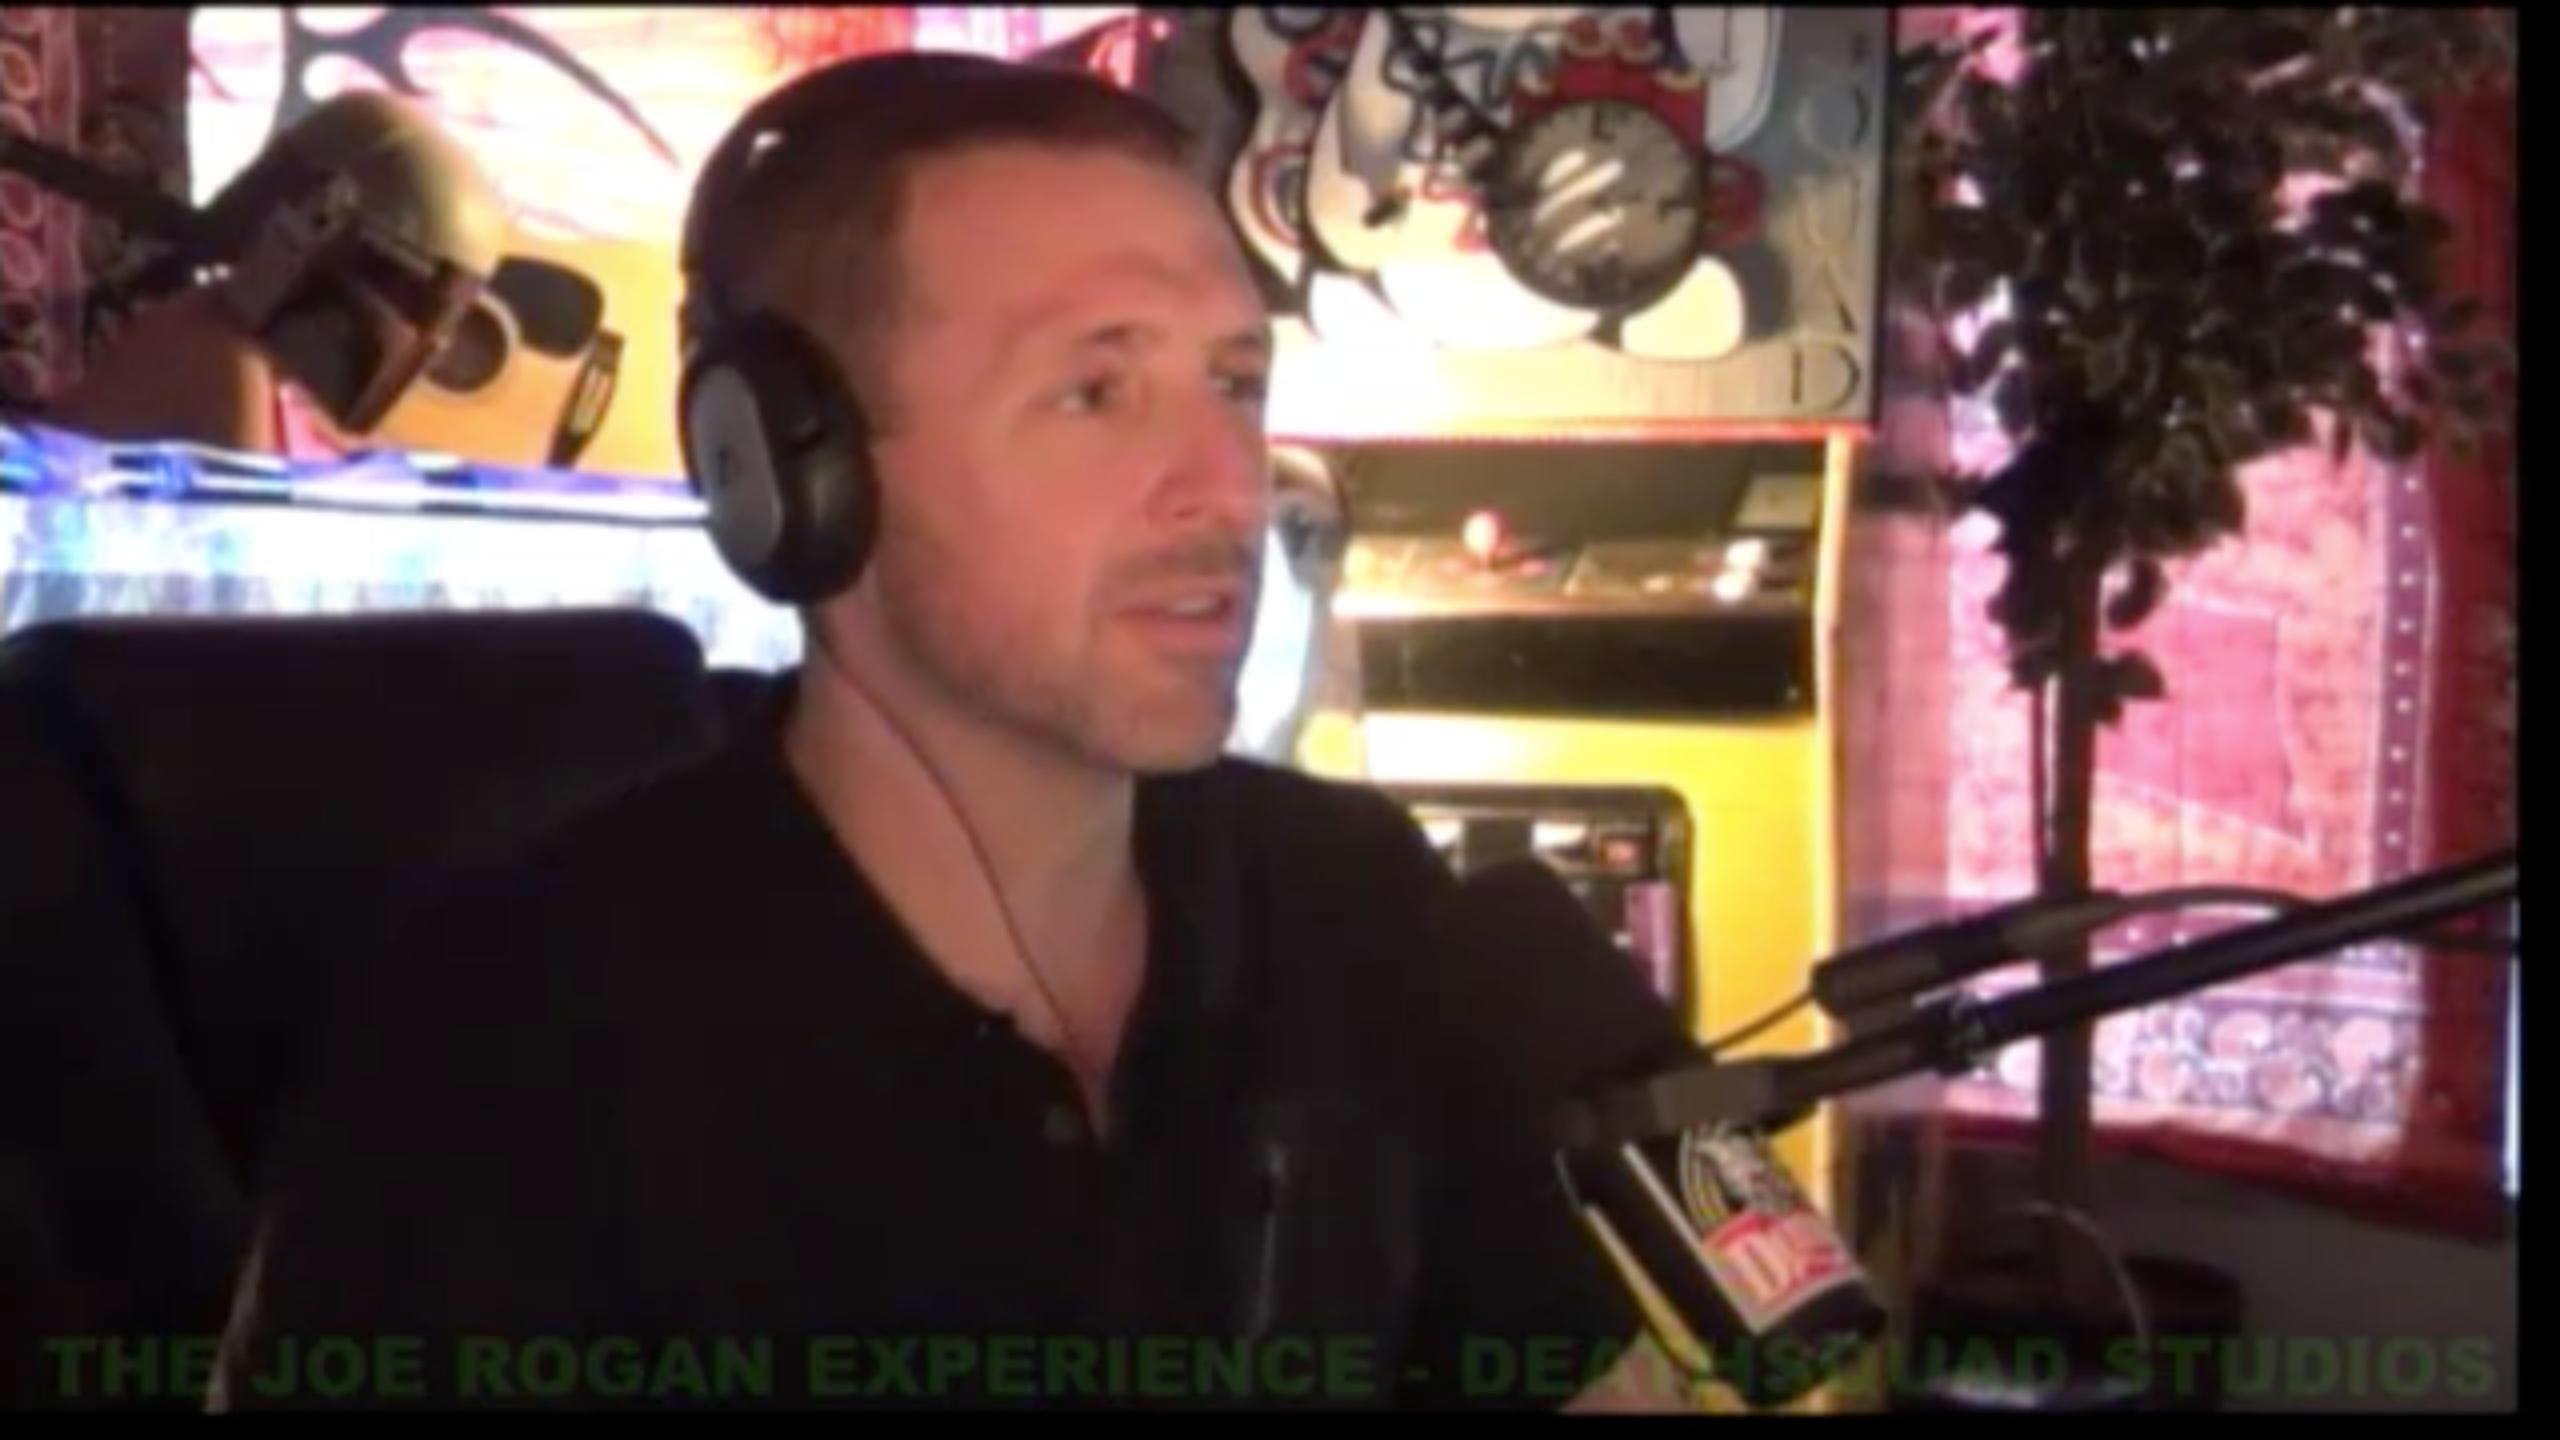 The Joe Rogan Experience JRE #275 - Dave Asprey, Brian Redban